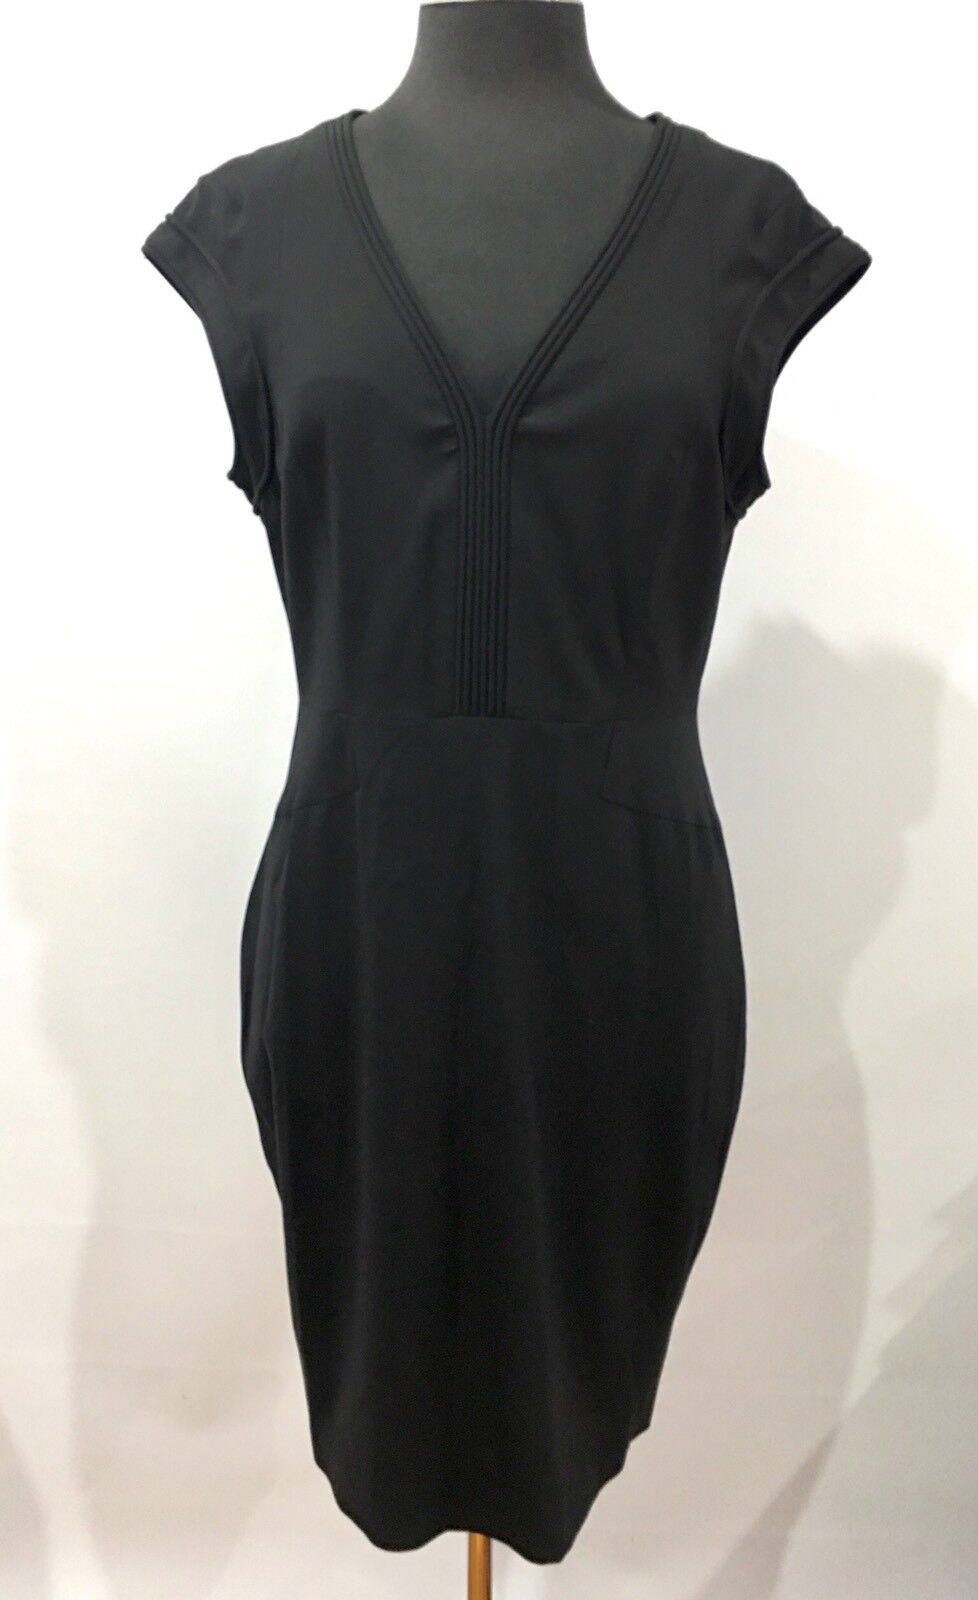 NEW Rachel Roy Quality Fabric Designer Fashion Vintage schwarz Dress Größe 12 US